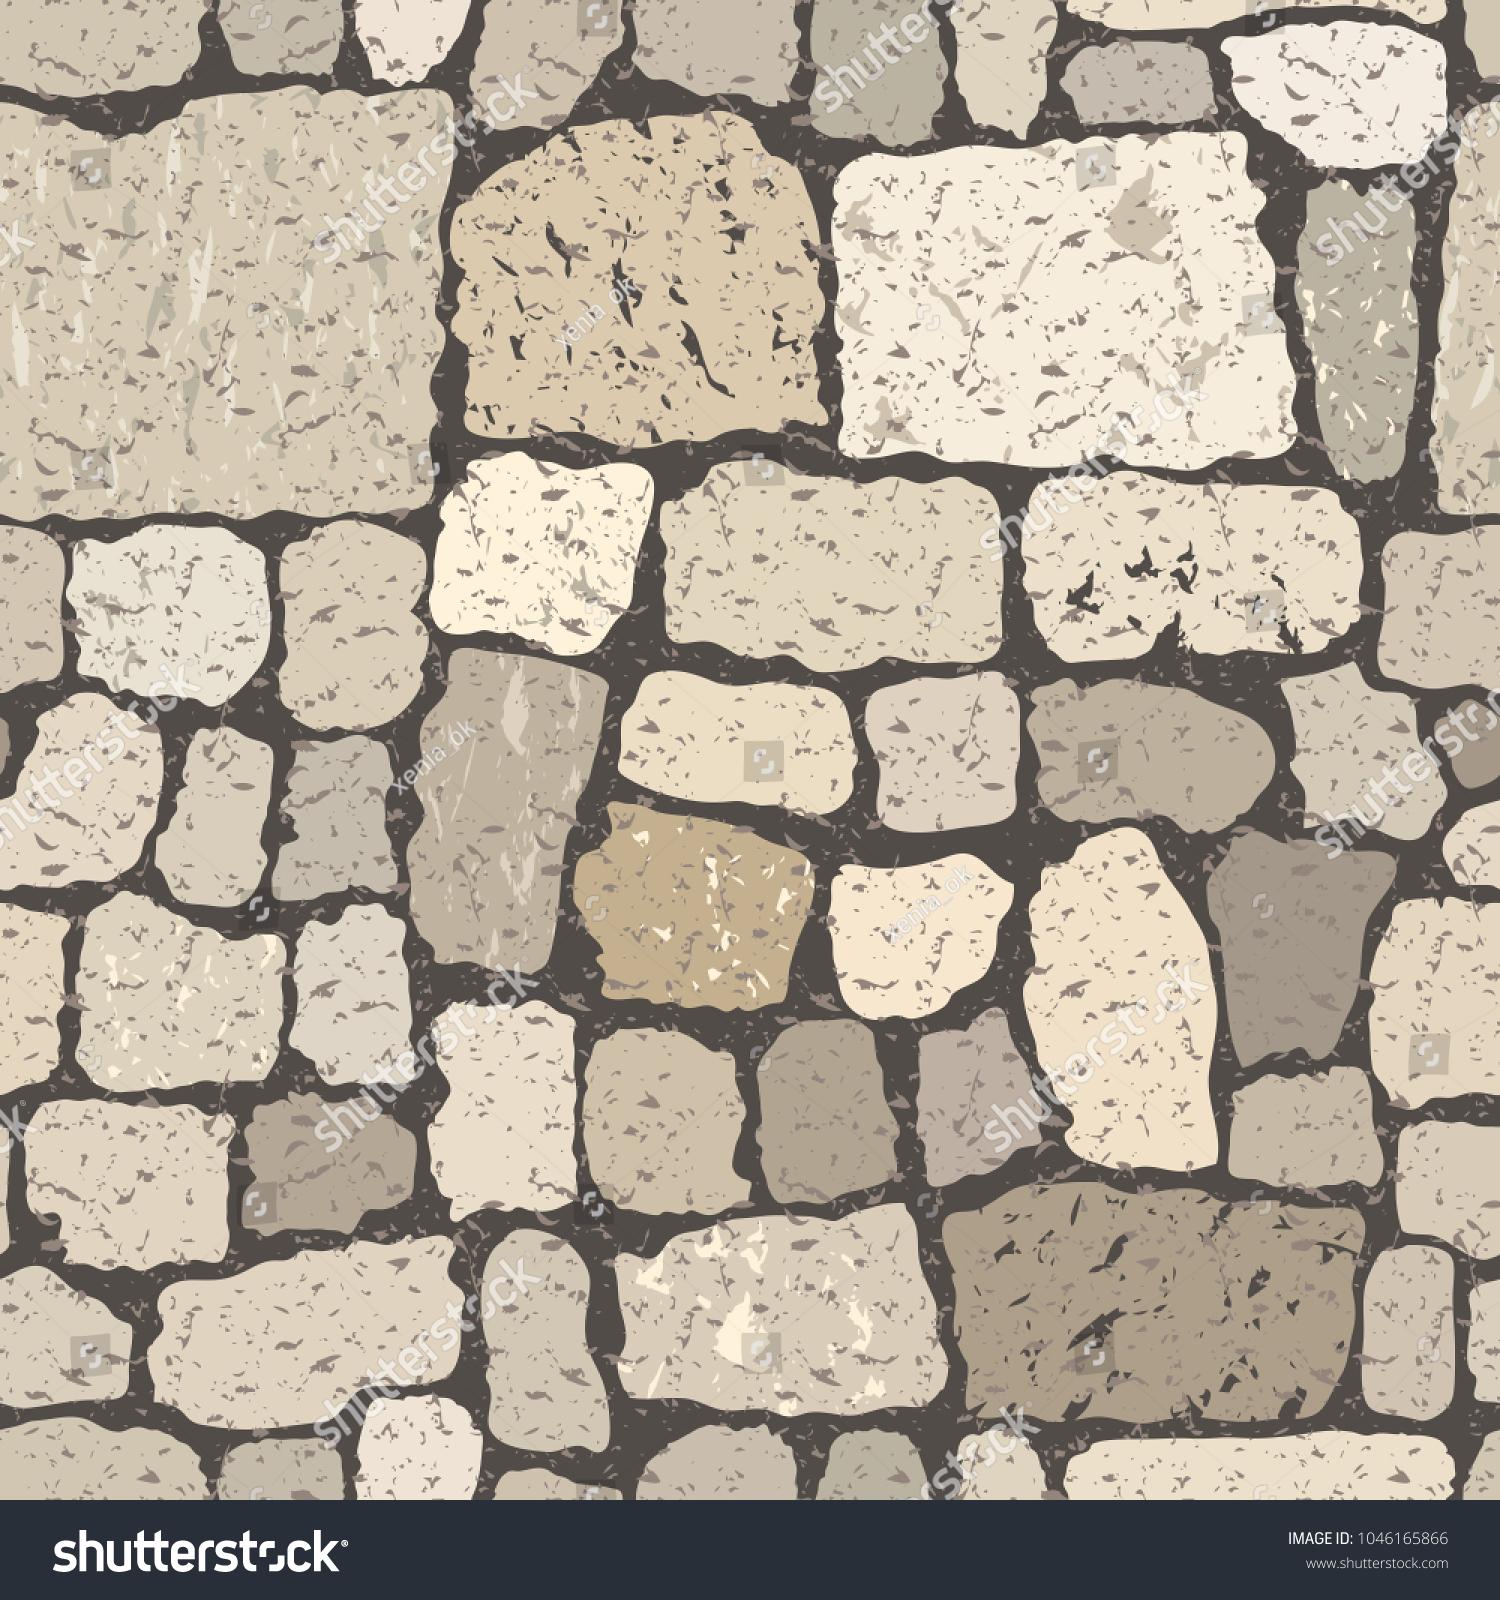 Crazy paving mould path pathway patio pavers garden stones shaper.